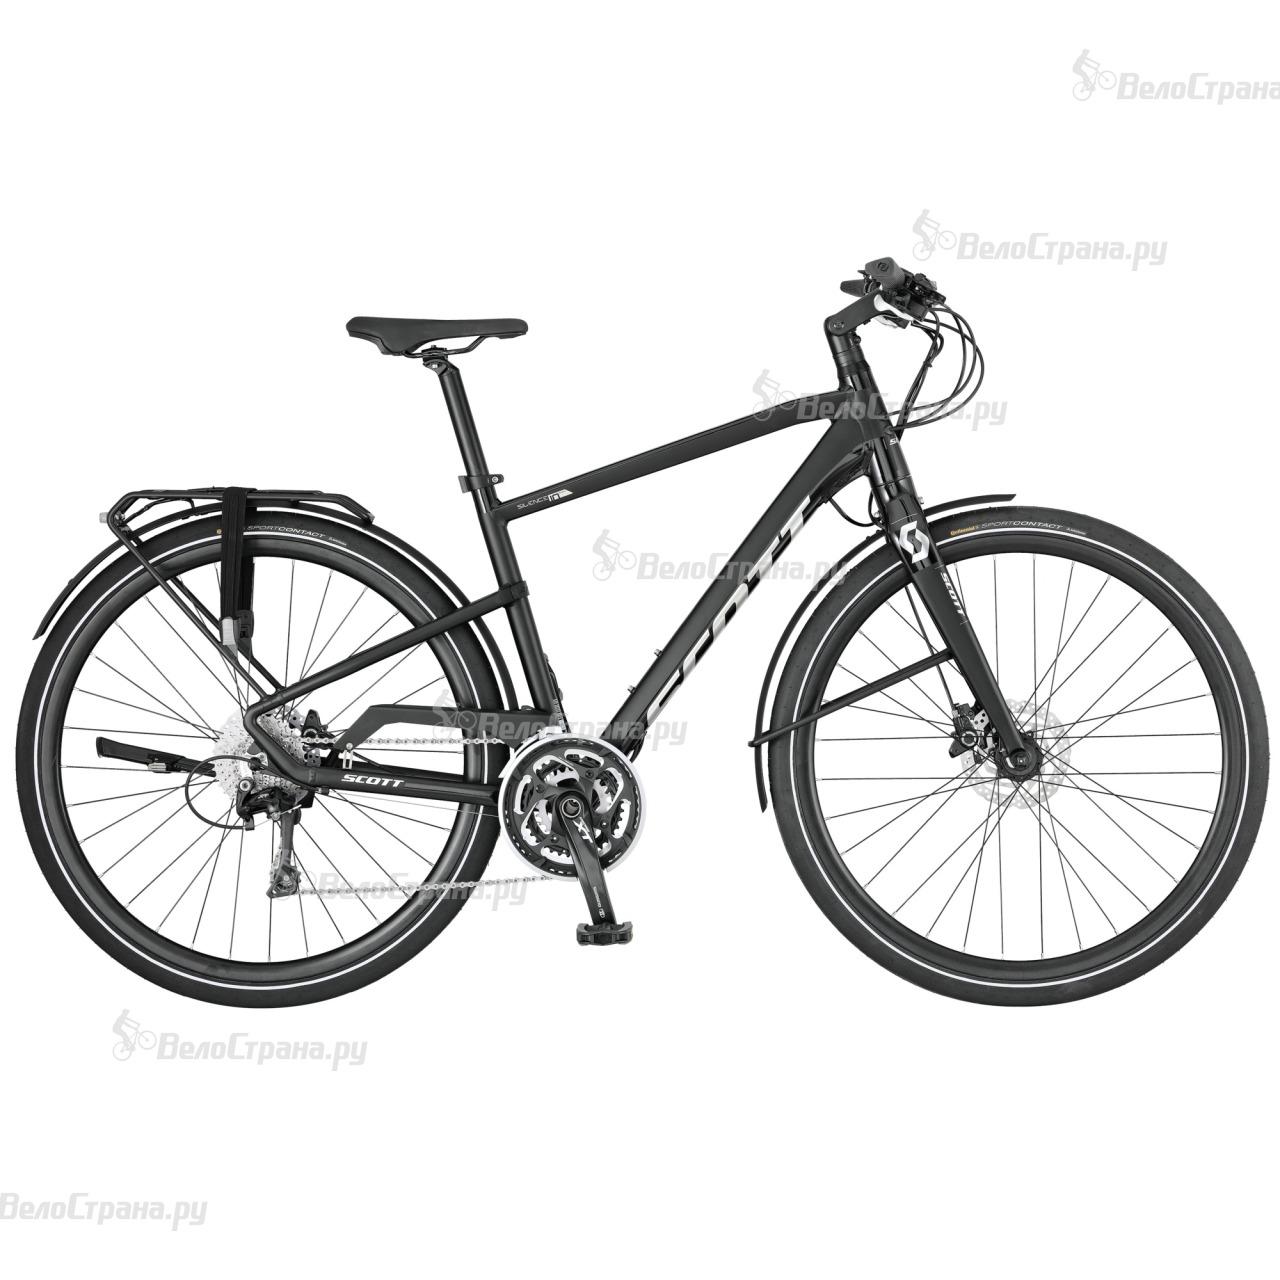 Велосипед Scott Silence 10 Men (2017) велосипед scott e silence speed 20 2017